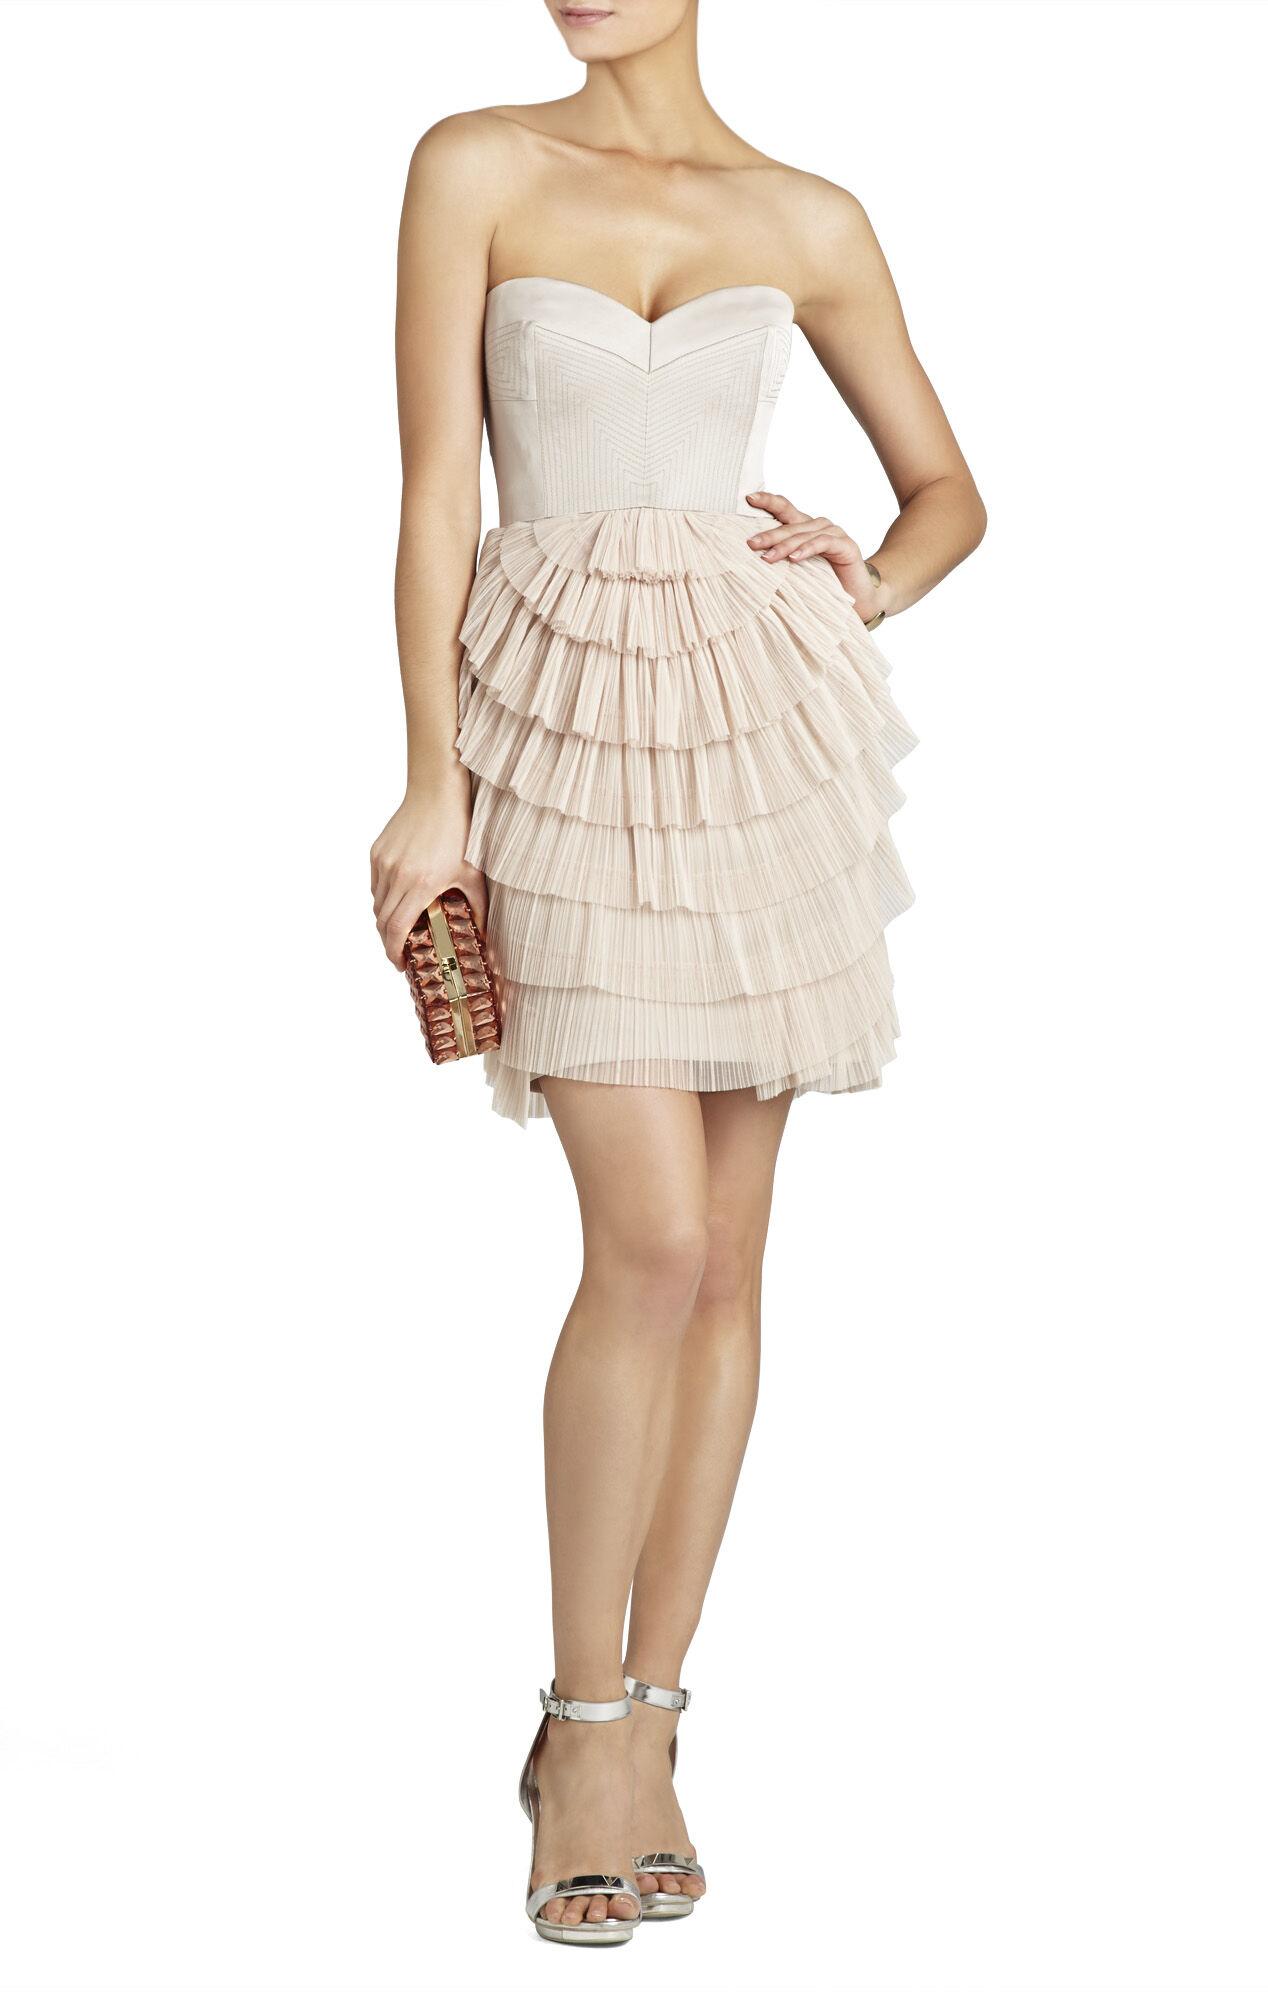 Sas Strapless Pleated-Skirt Dress